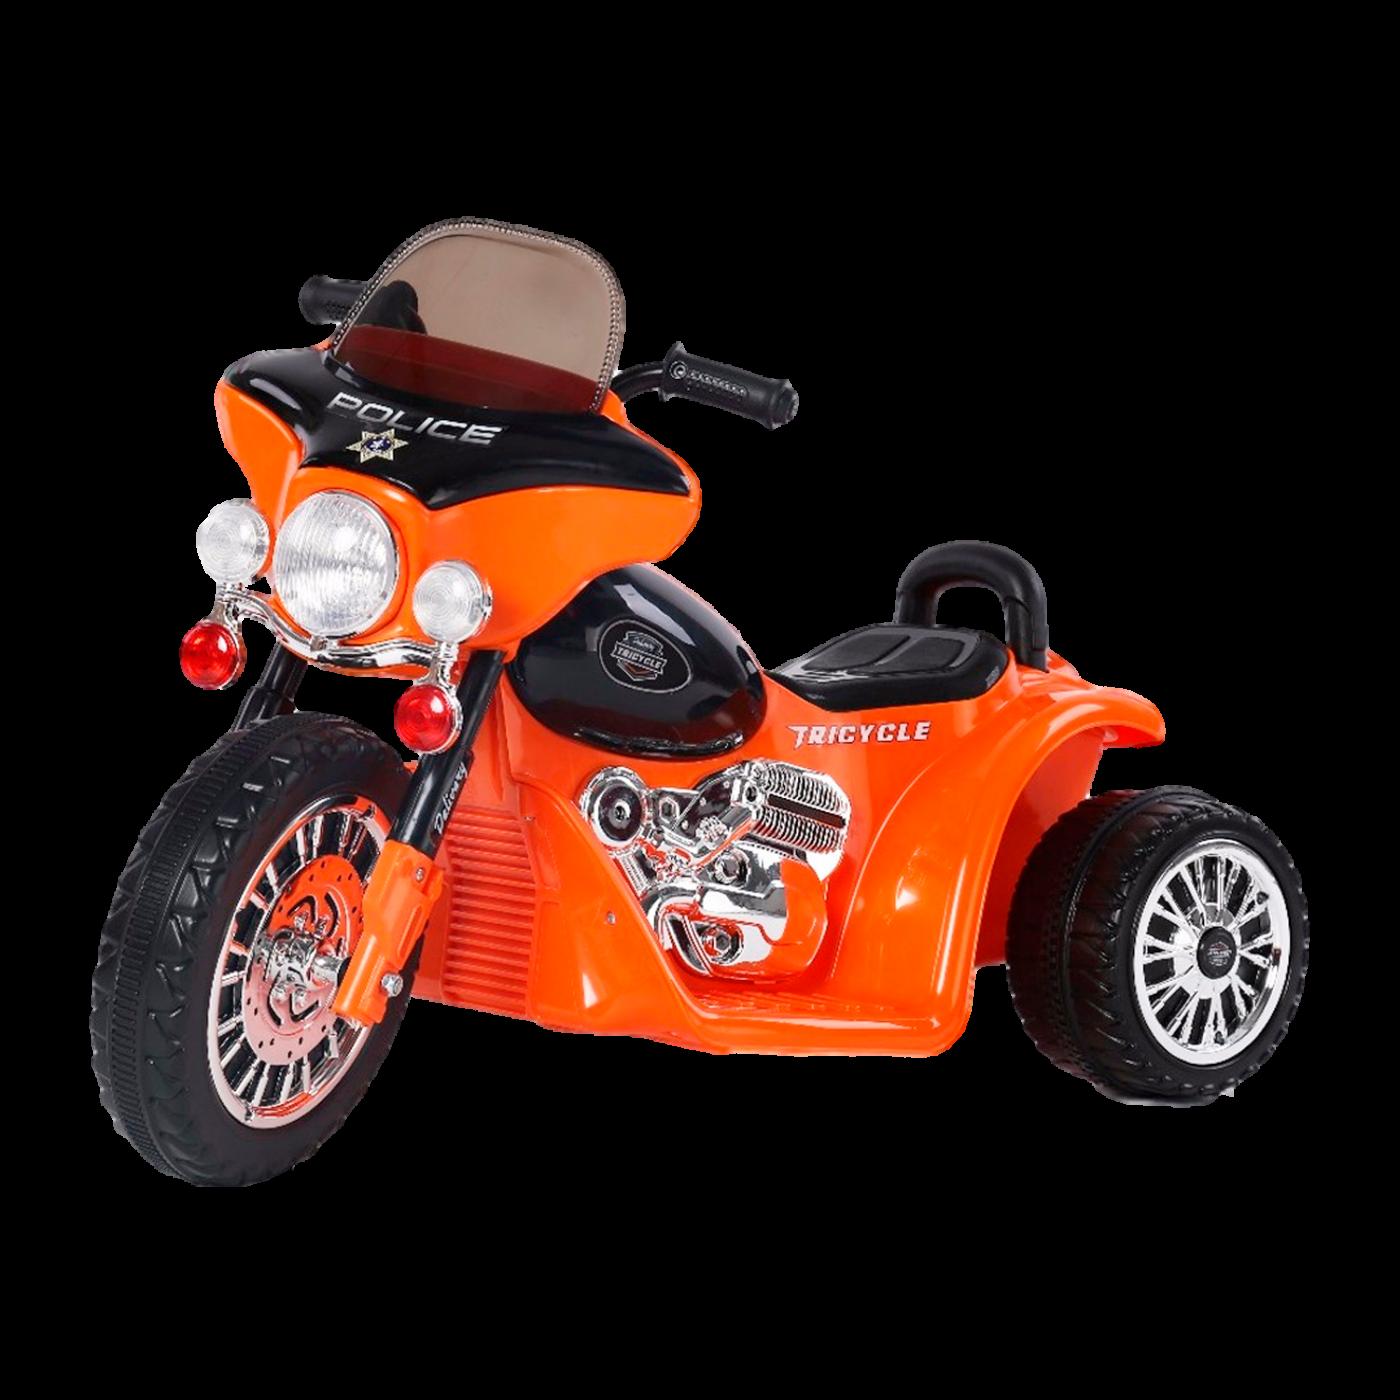 Электромобиль JT568 (трицикл, 6V) оранжевый